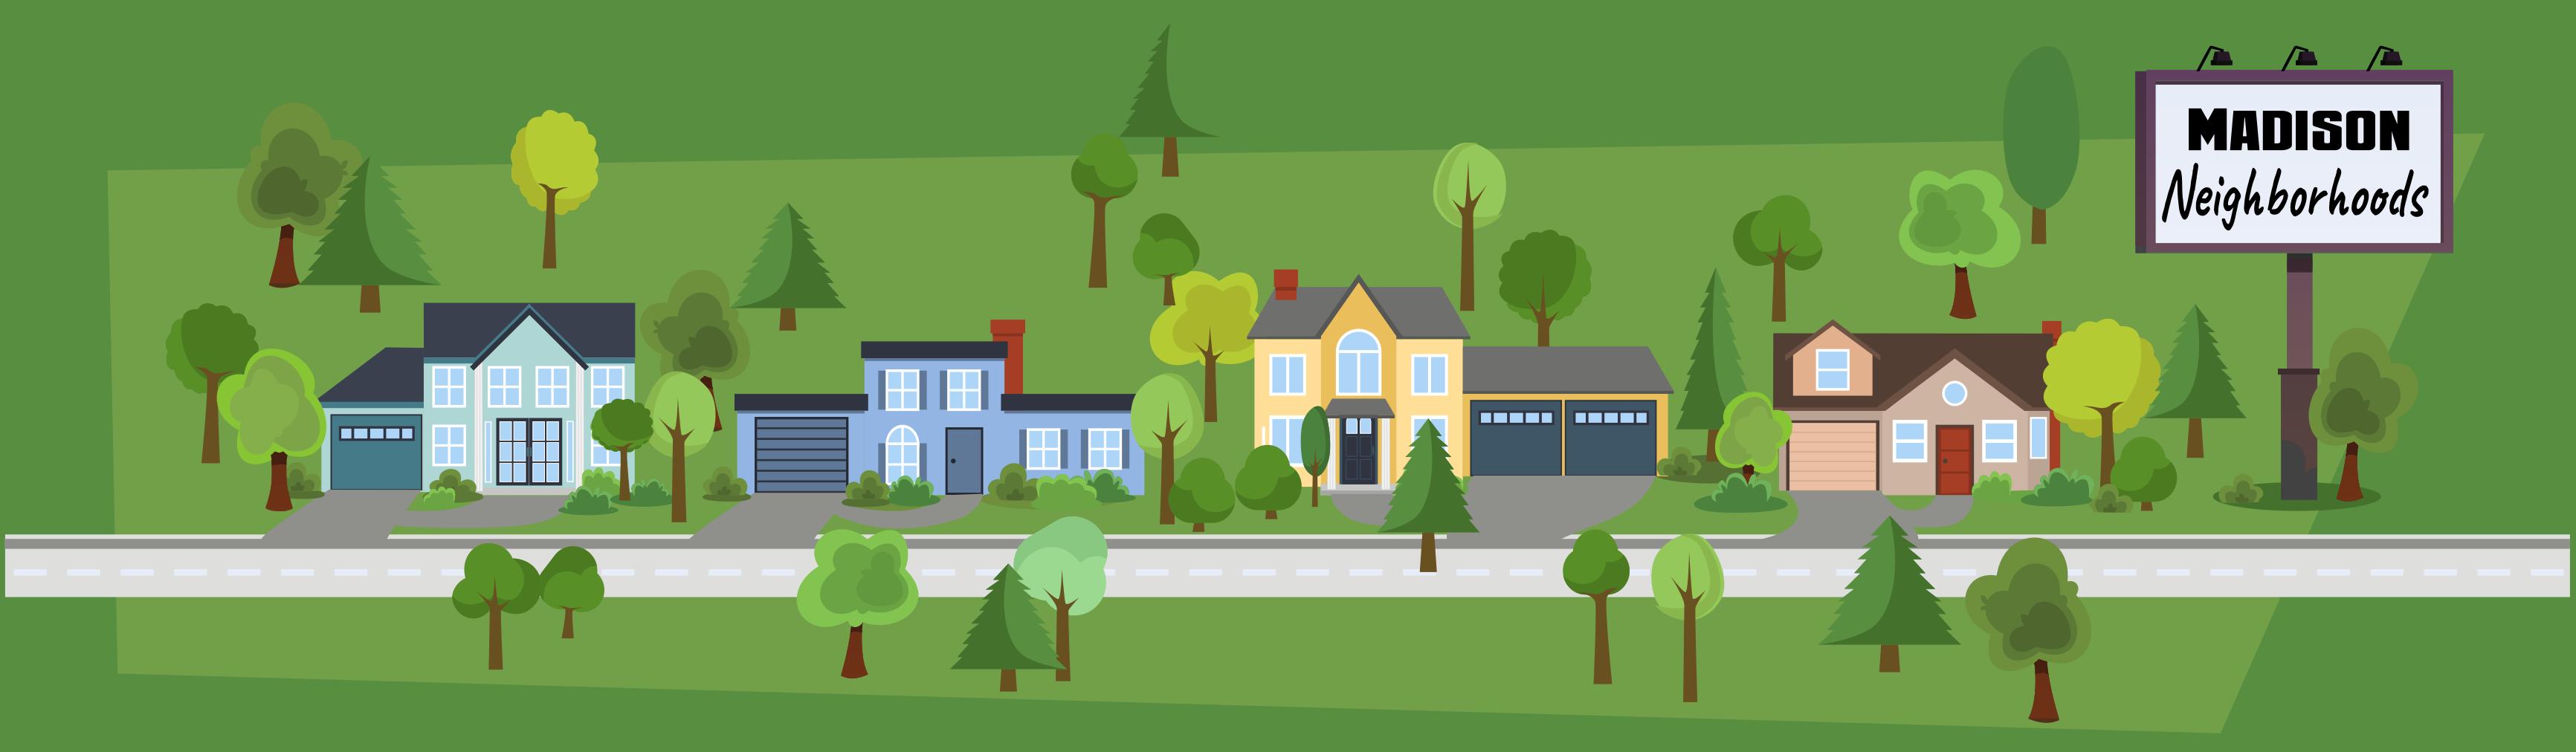 Neighborhoods in the city of Madison, Wisconsin